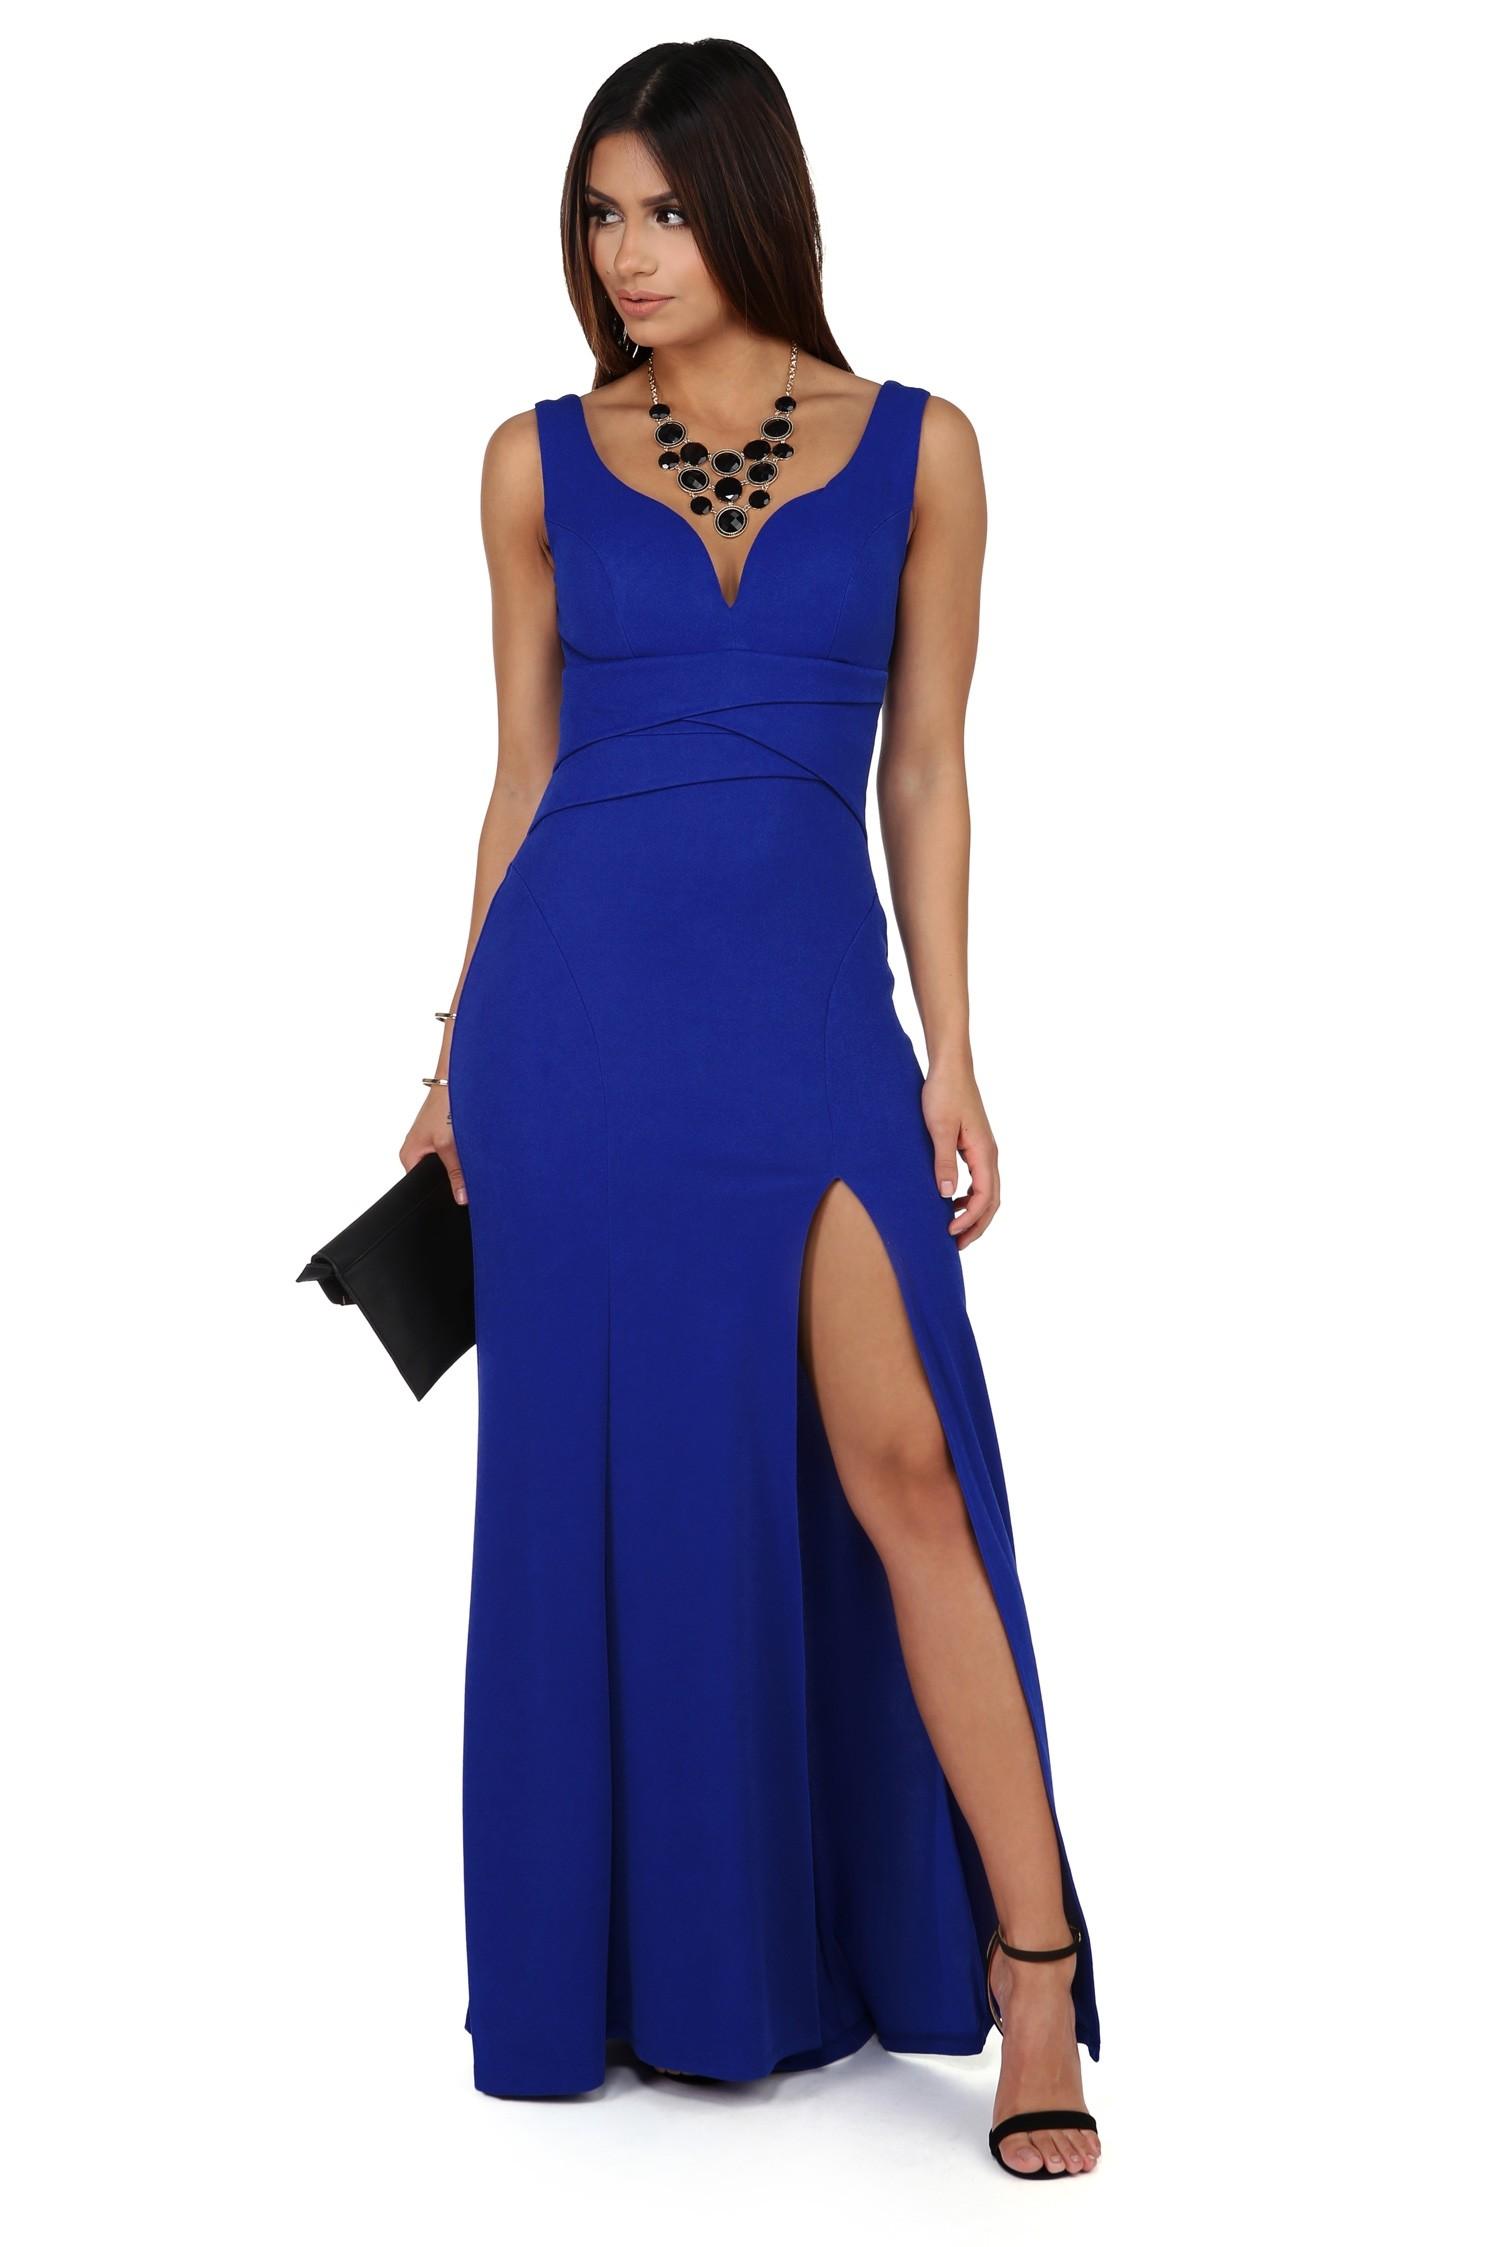 royal blue prom dresses leanne royal blue prom dress atqozpg